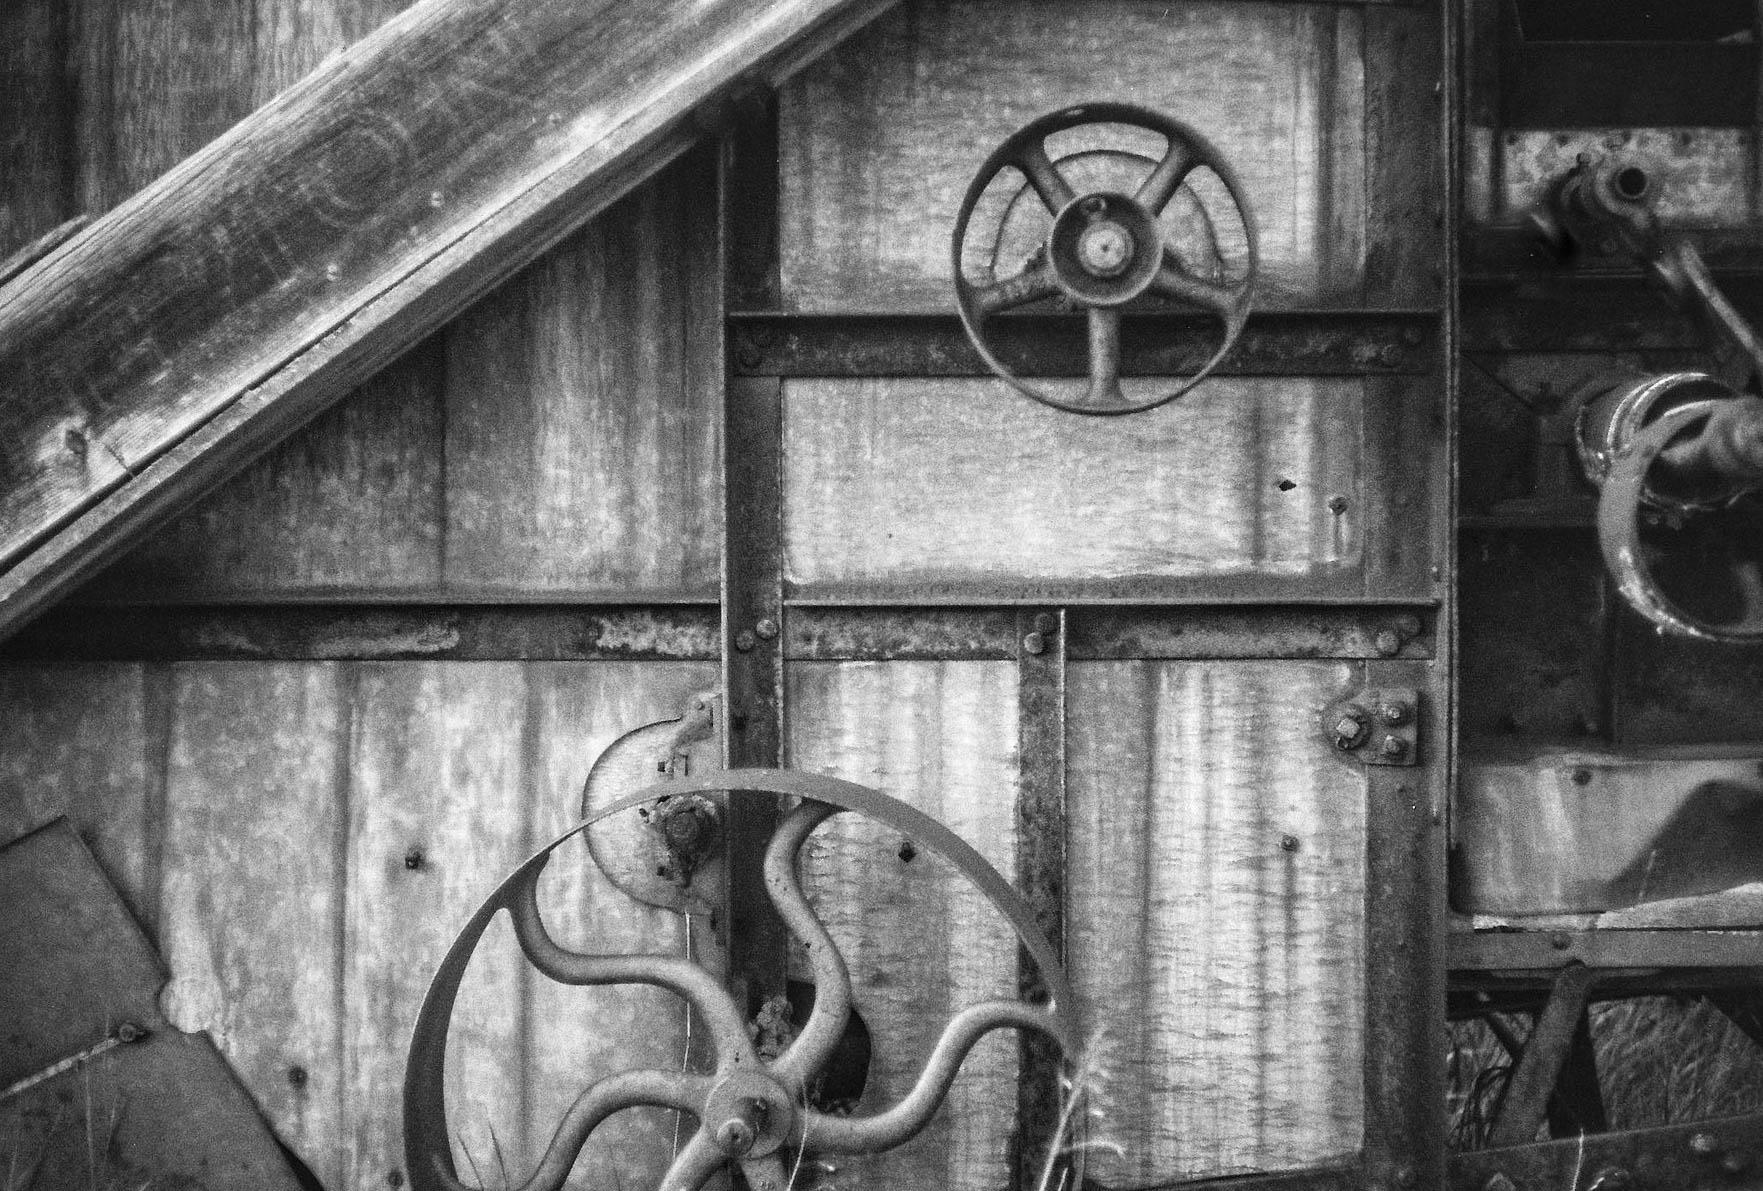 Threshing machine Bulwark, Alberta Leica M3, Canon 50mm F1.4 Ilford Pan F Plus 50 film 7.16